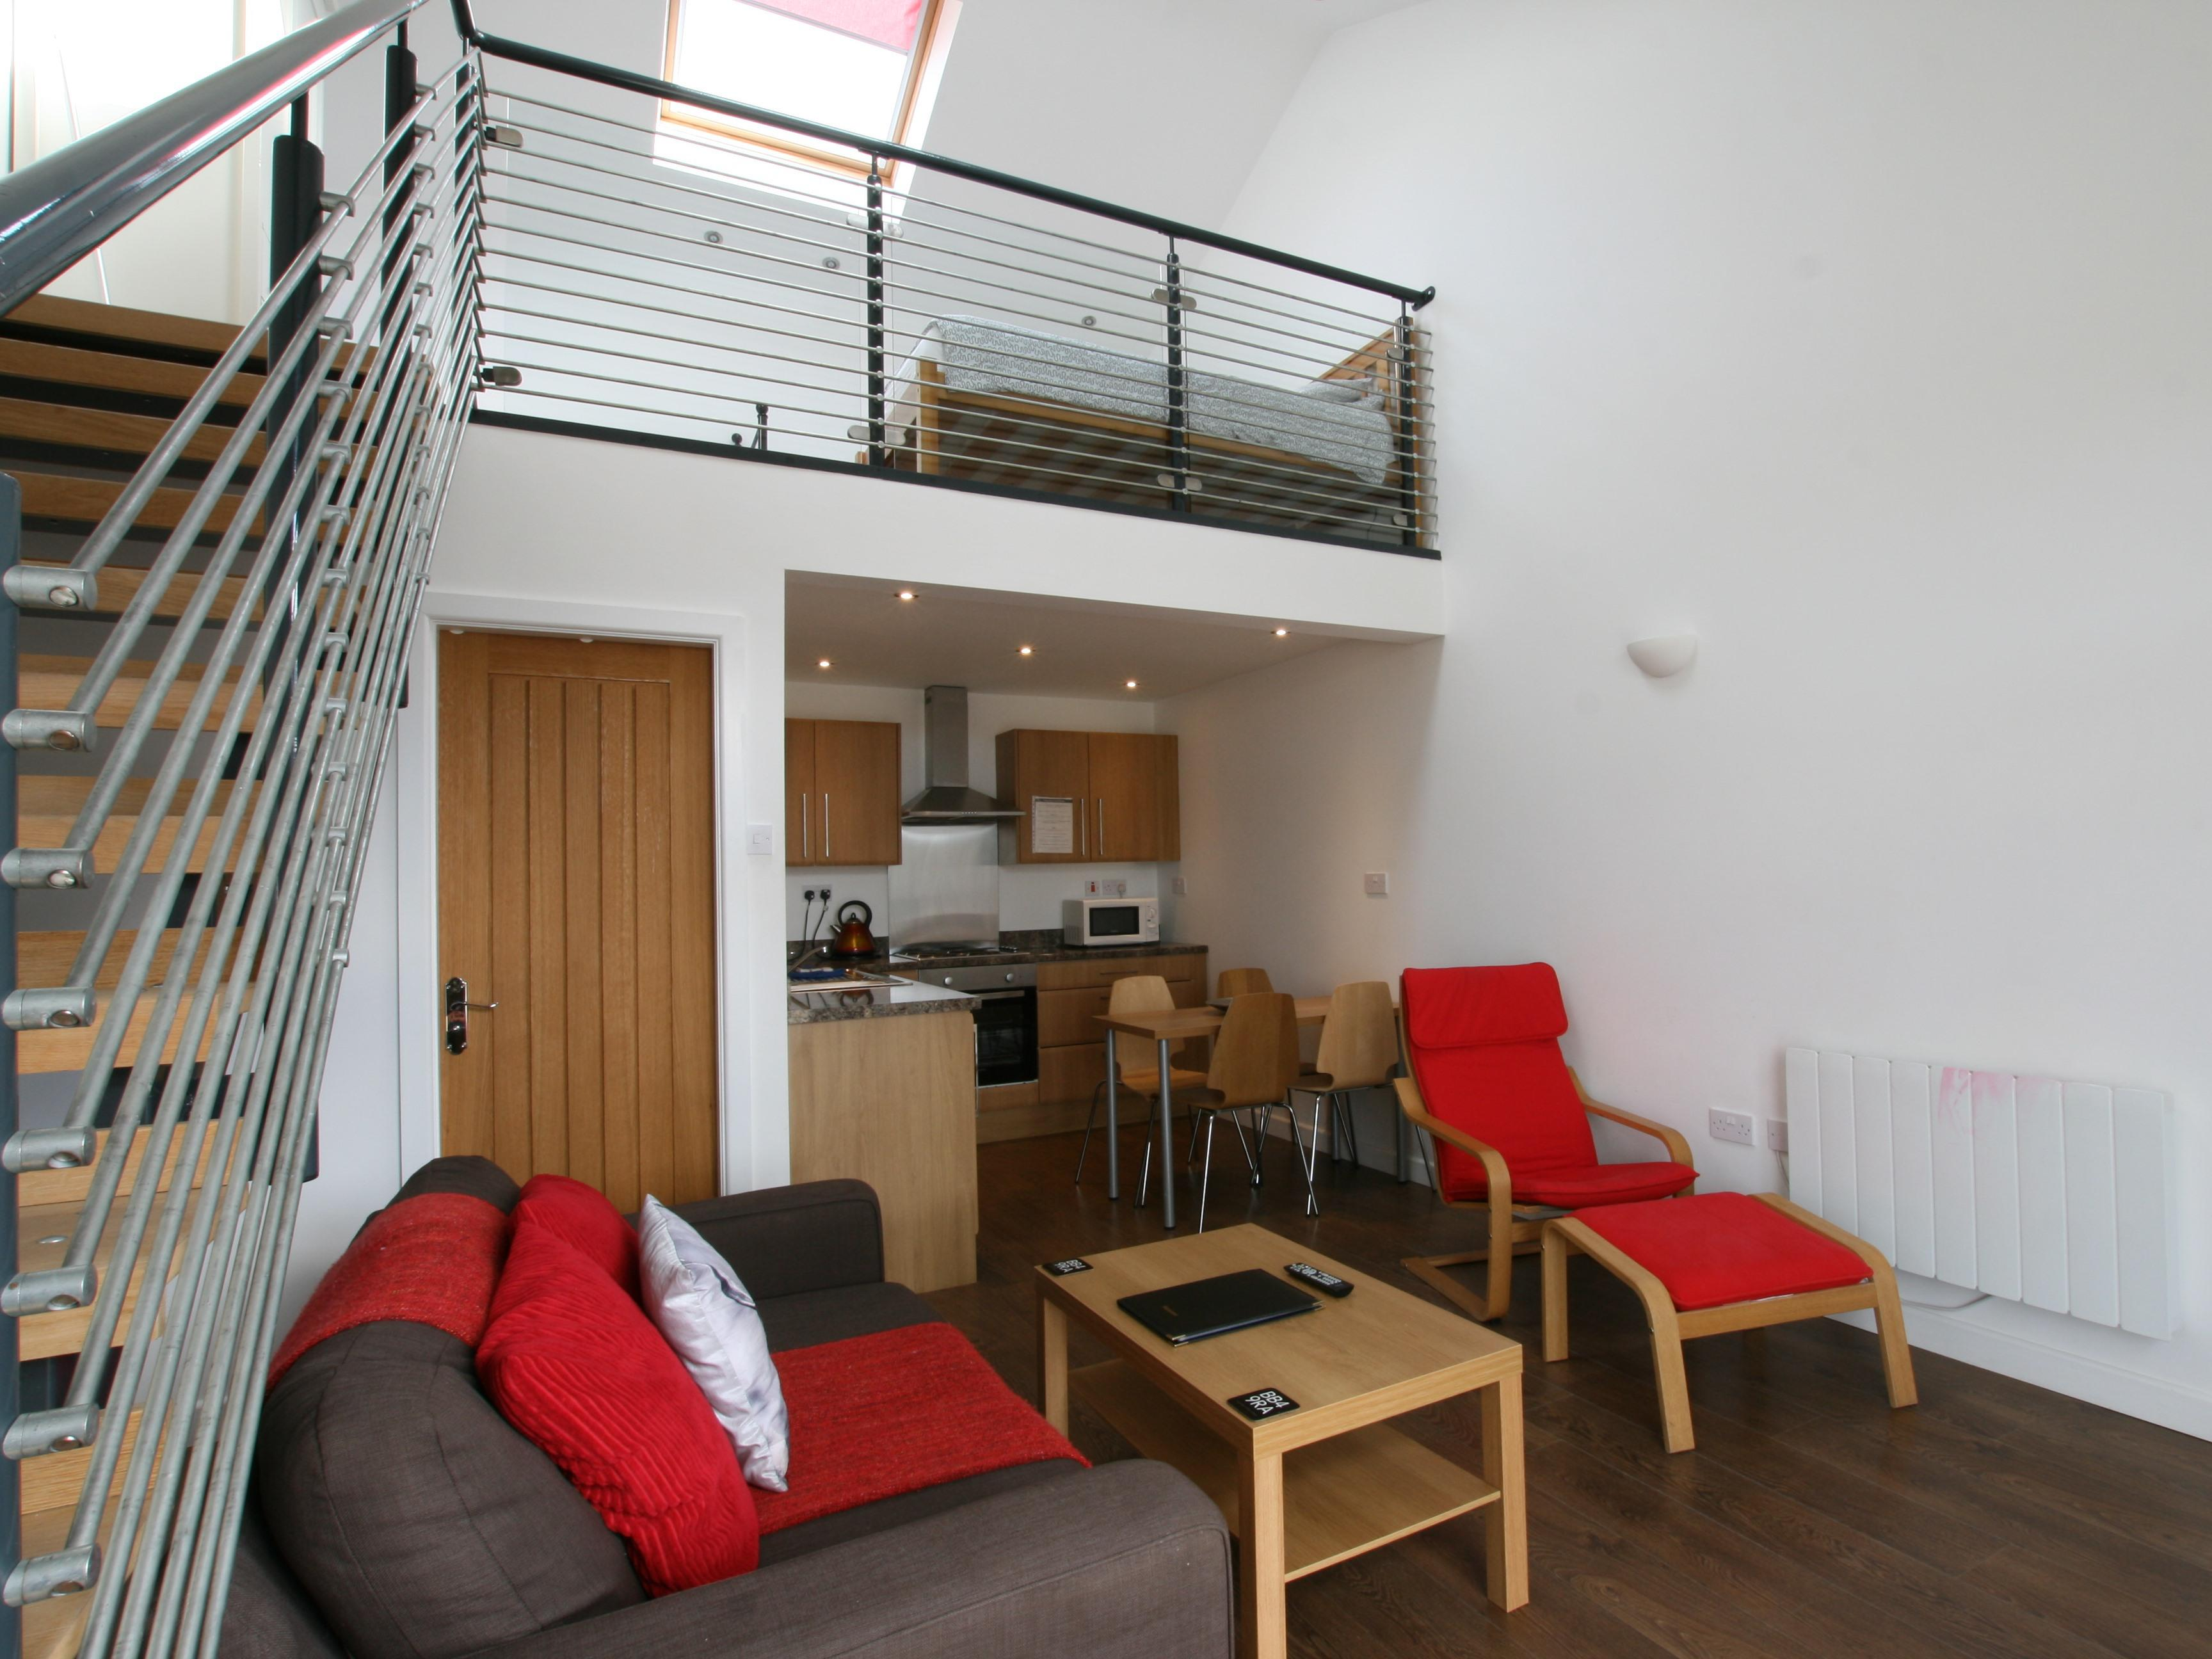 Cottage-Cottage-Private Bathroom-Oak - Holiday Home